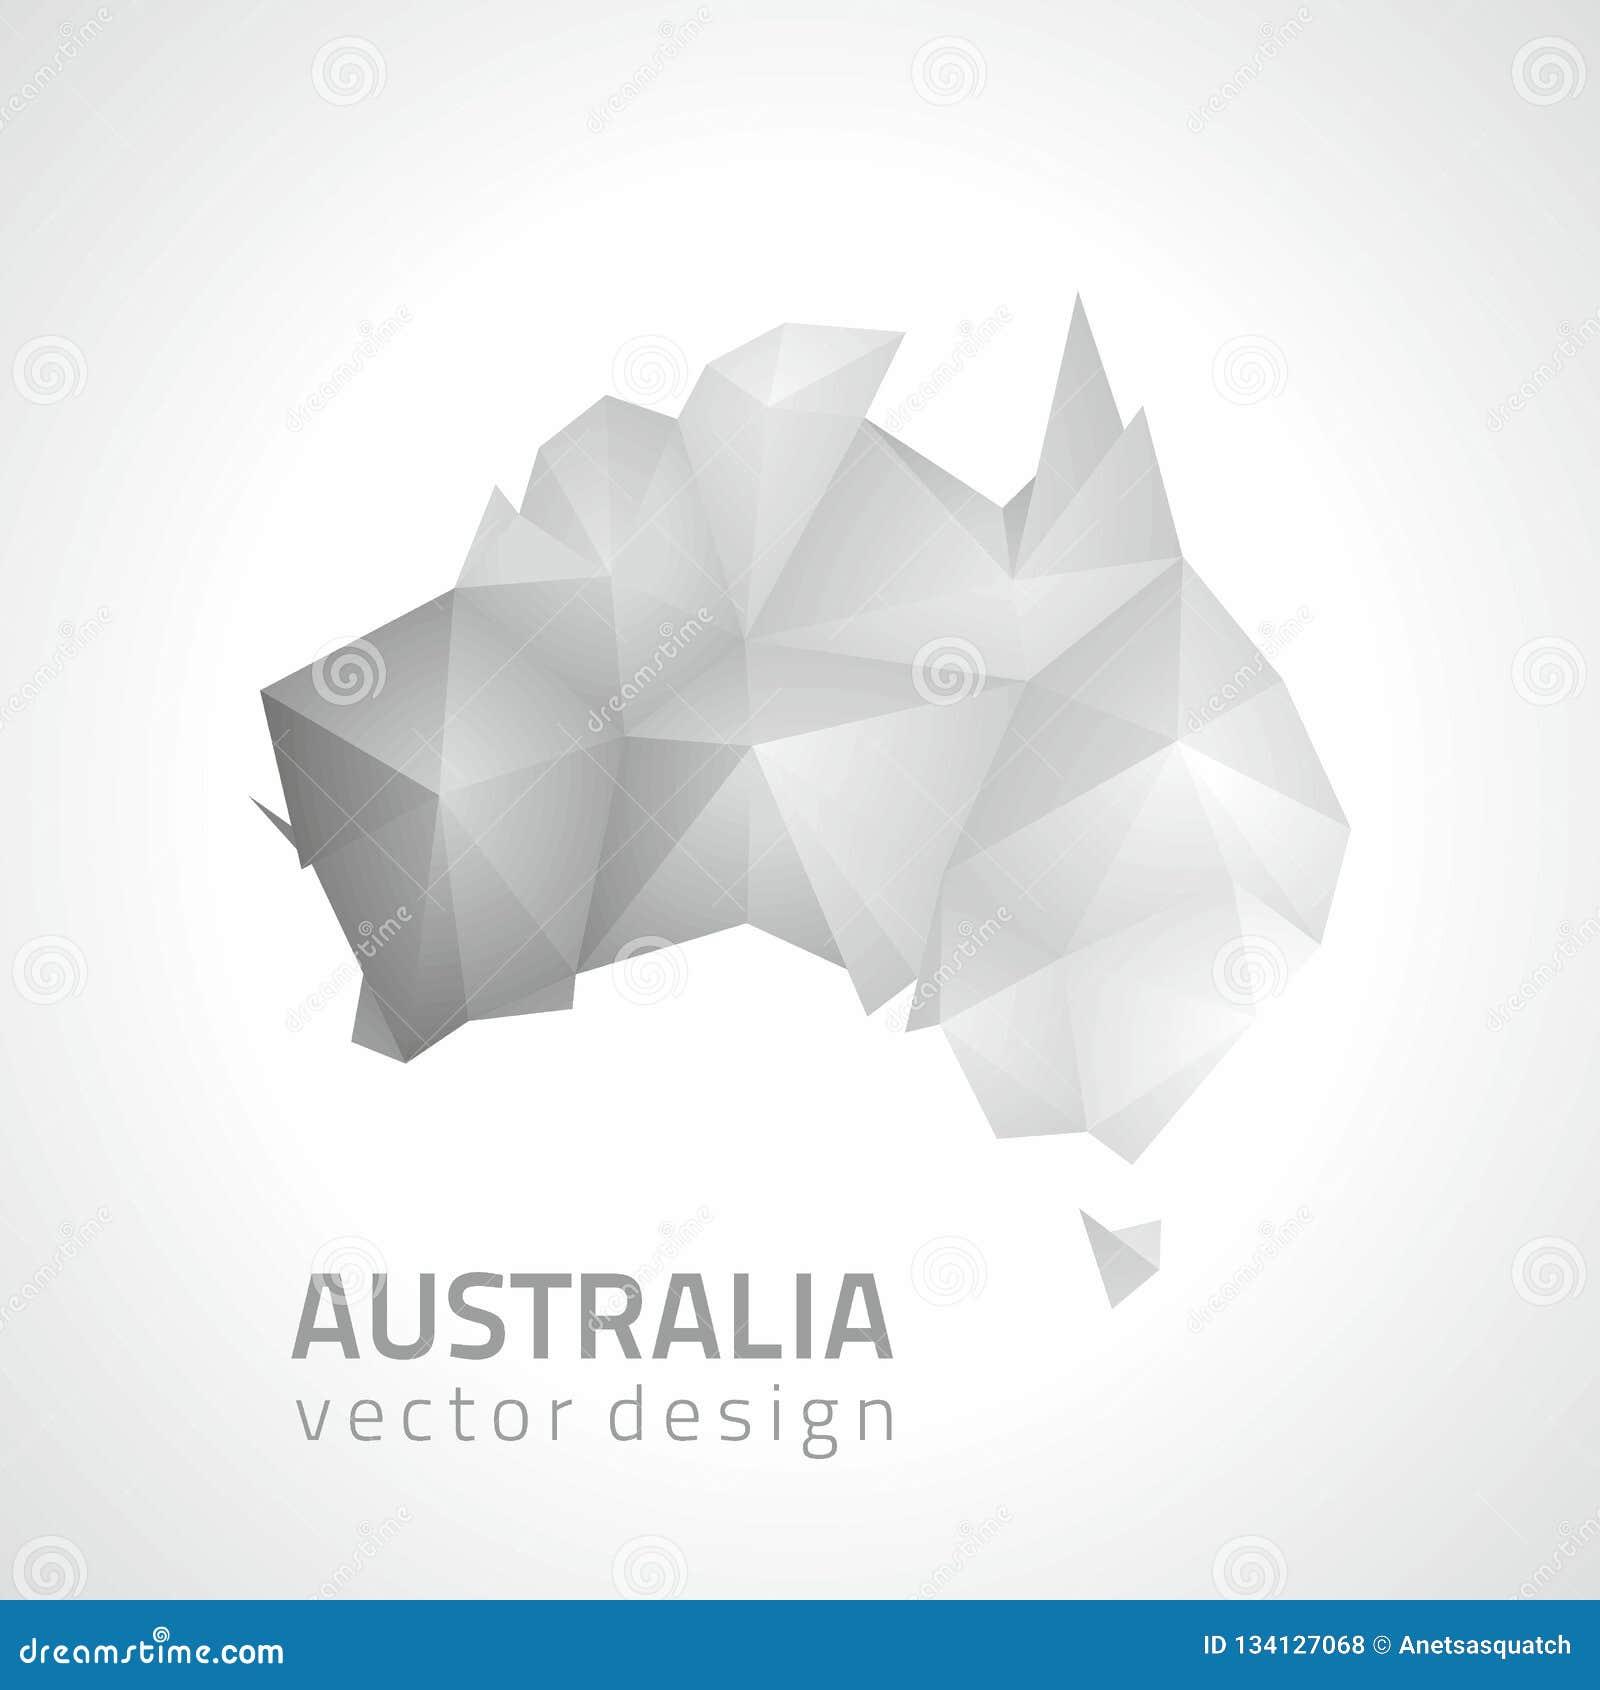 Australia Map Grey.Australia Polygonal Triangle Grey And Silver Vector Map Stock Vector